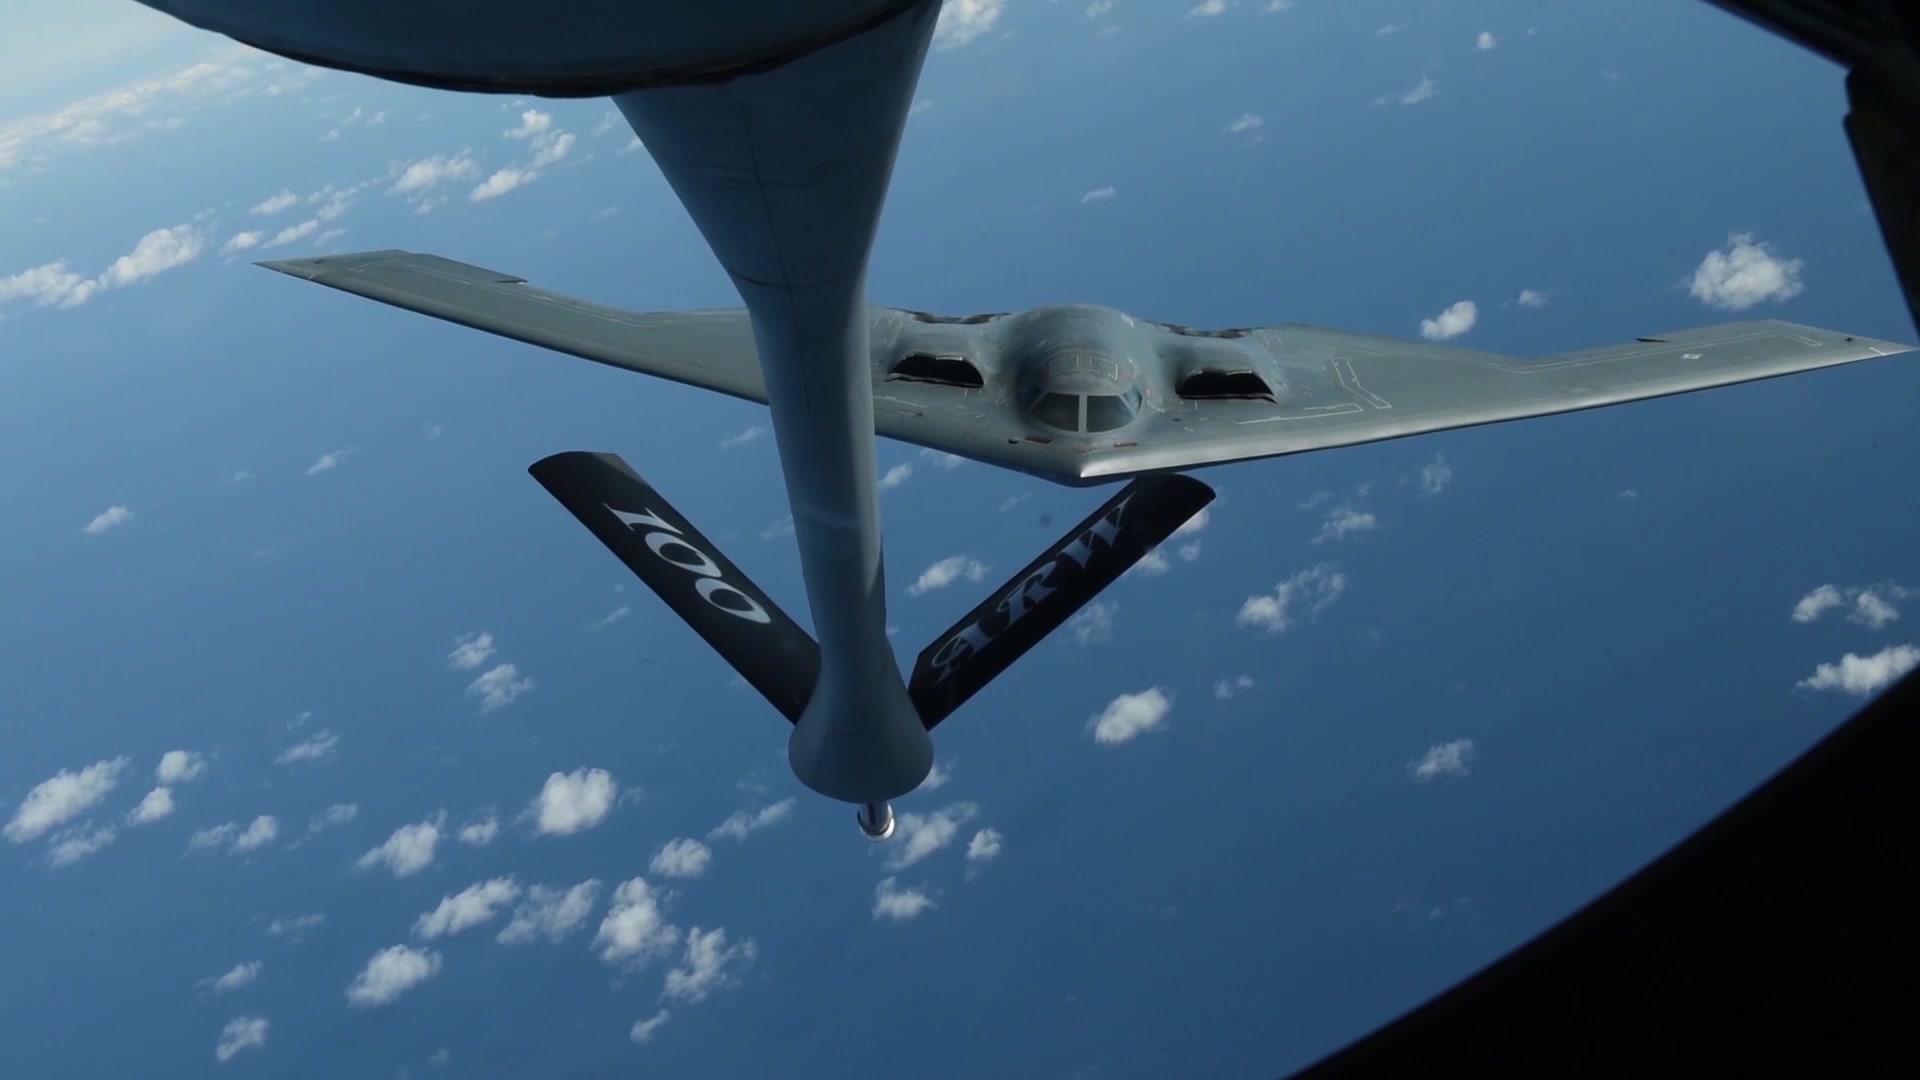 B-Roll stringer showcasing U.S. Air Force B-2 Spirit take-off and in-flight refueling.